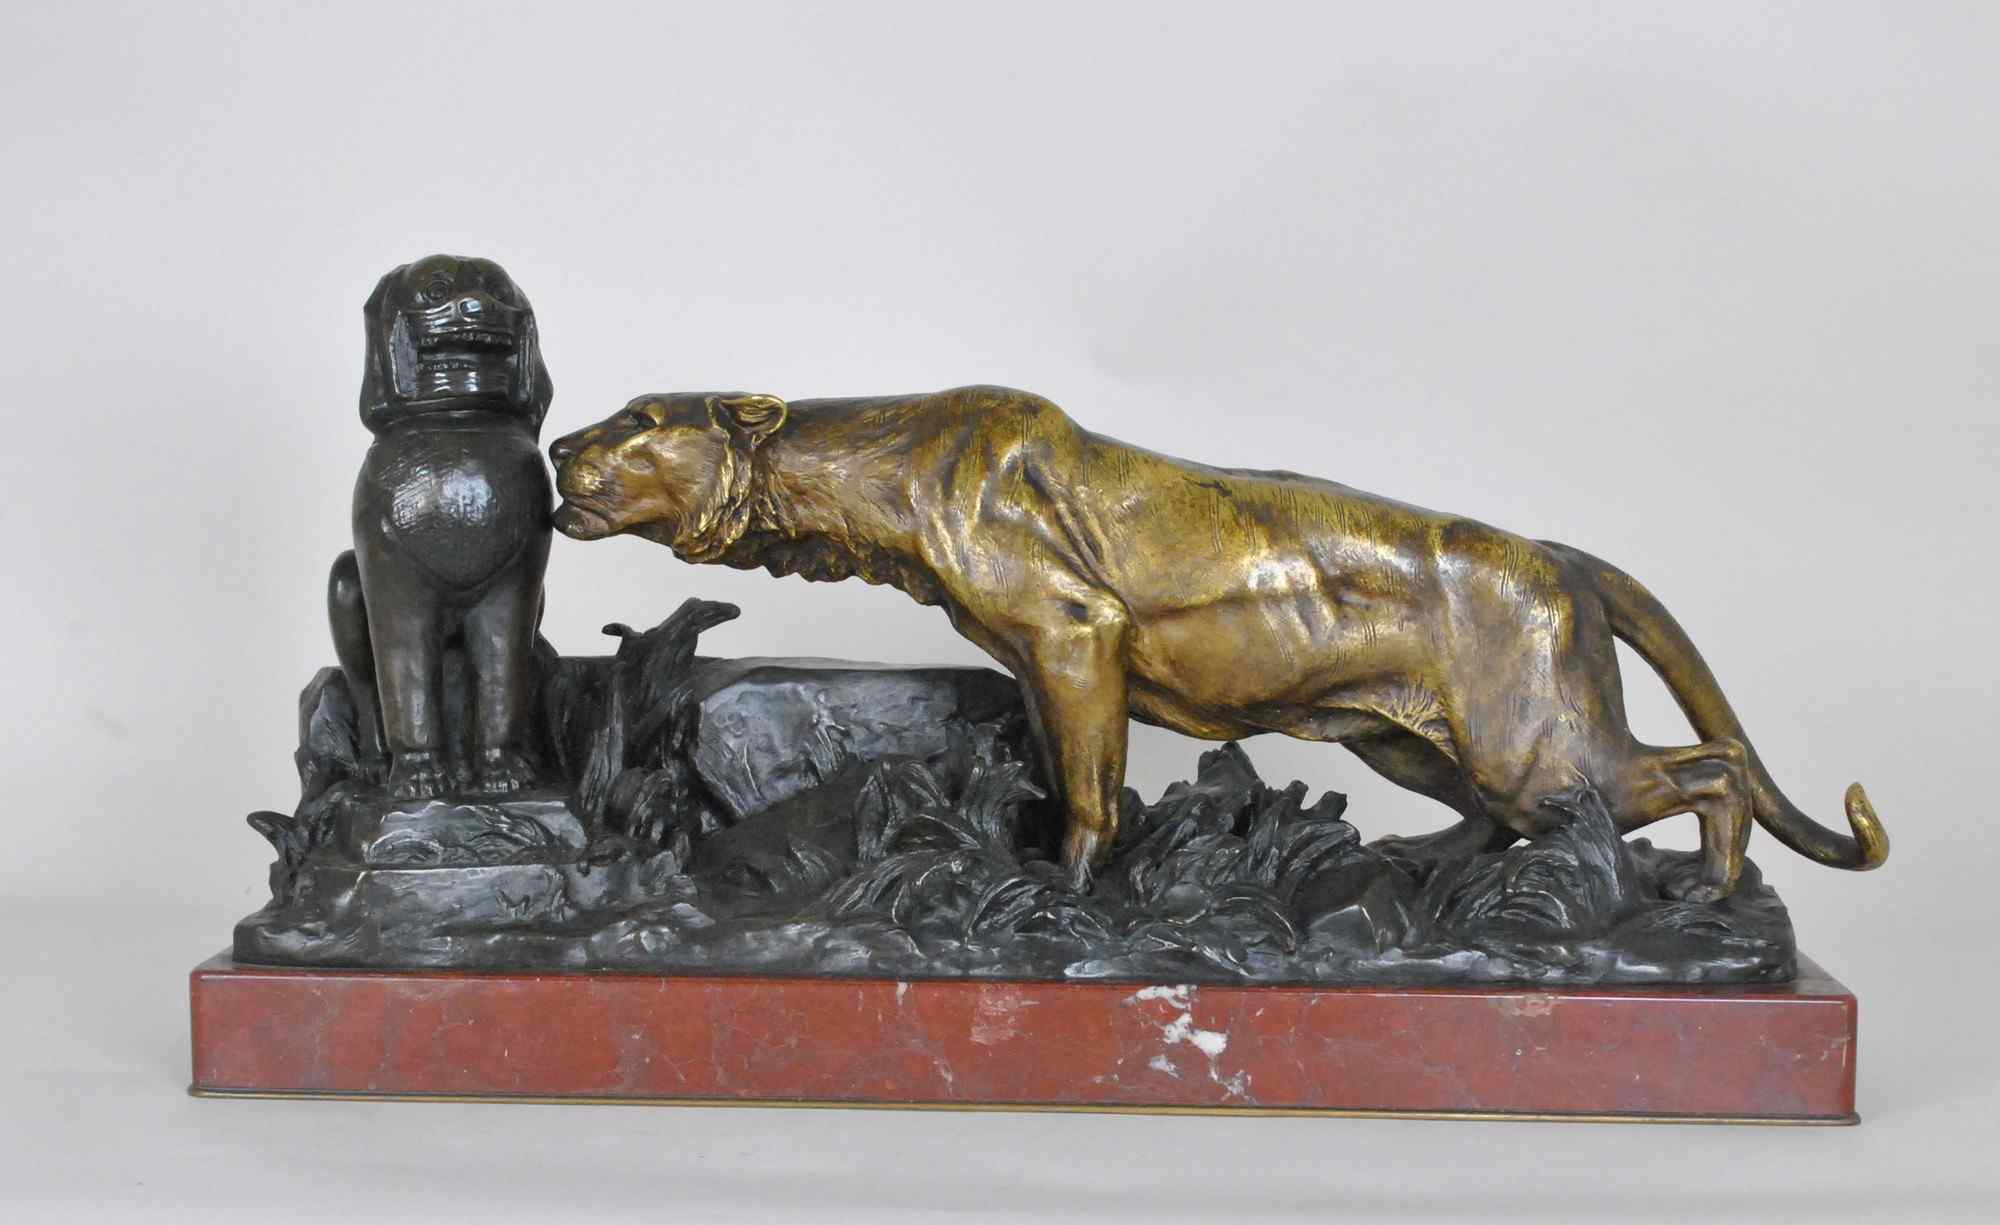 G Gardet / Barbedienne, pantera tra le rovine, bronzo